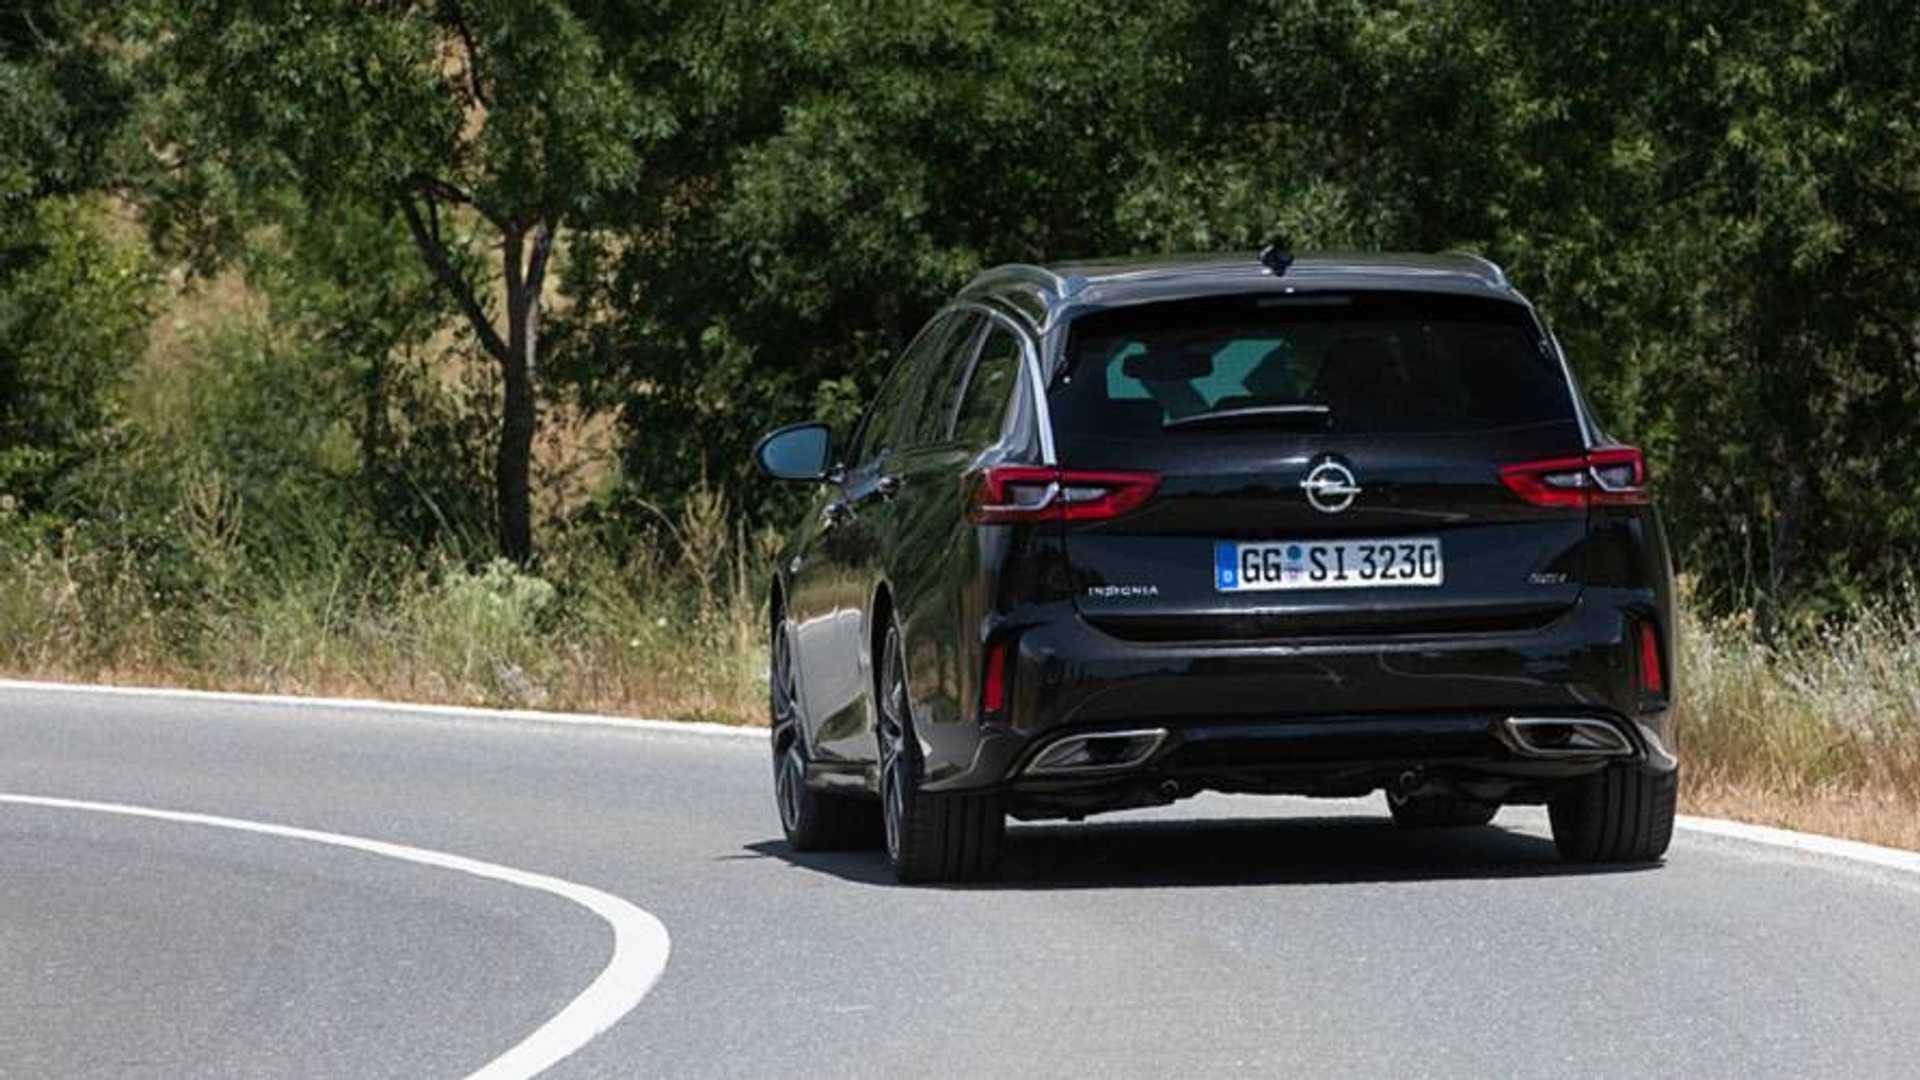 Prueba Opel Insignia Sports Tourer Gsi 2019 Familiar O Deportivo 2018